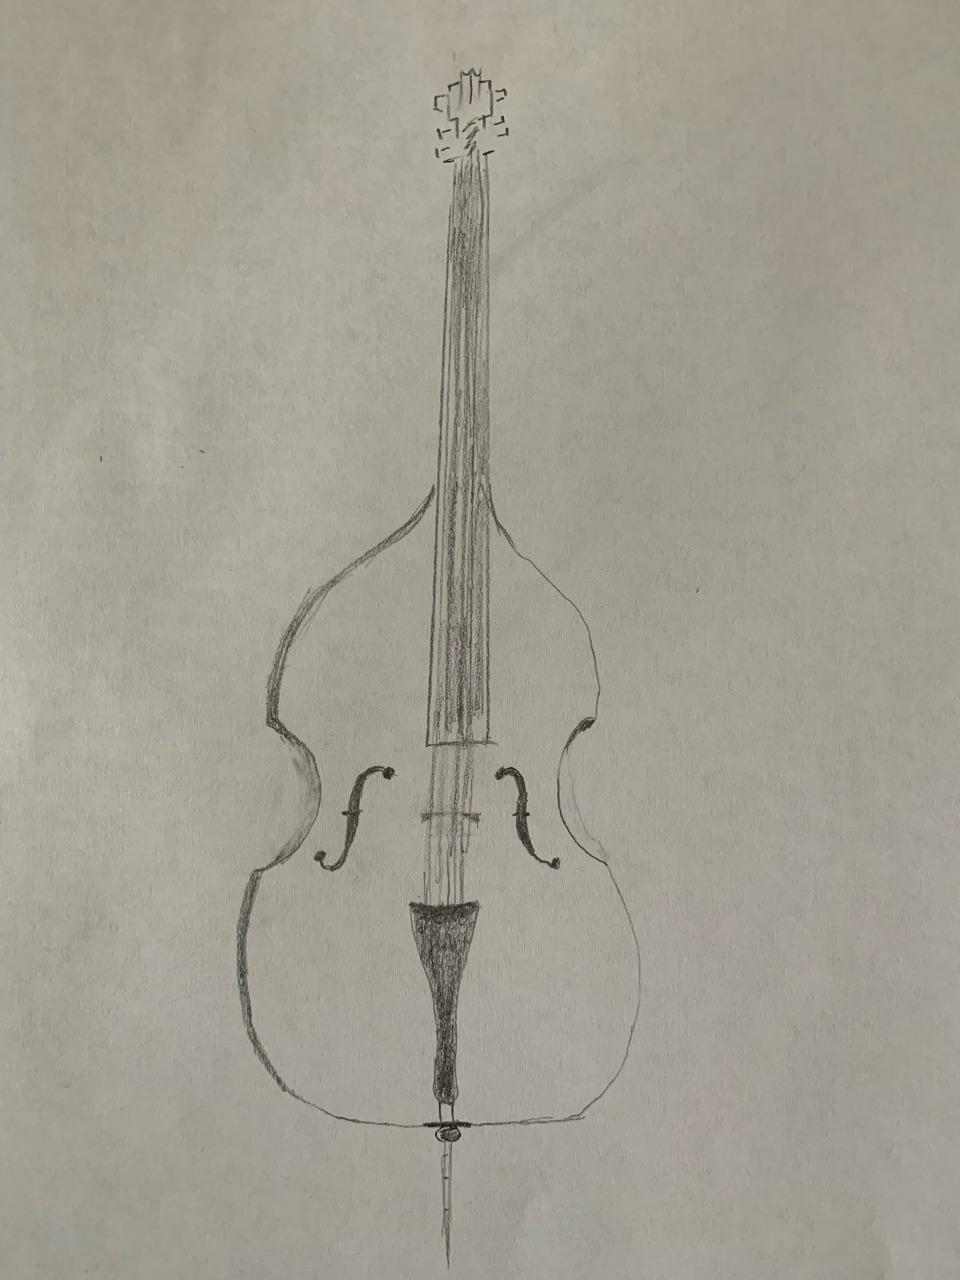 Sketch by Sarah Joy